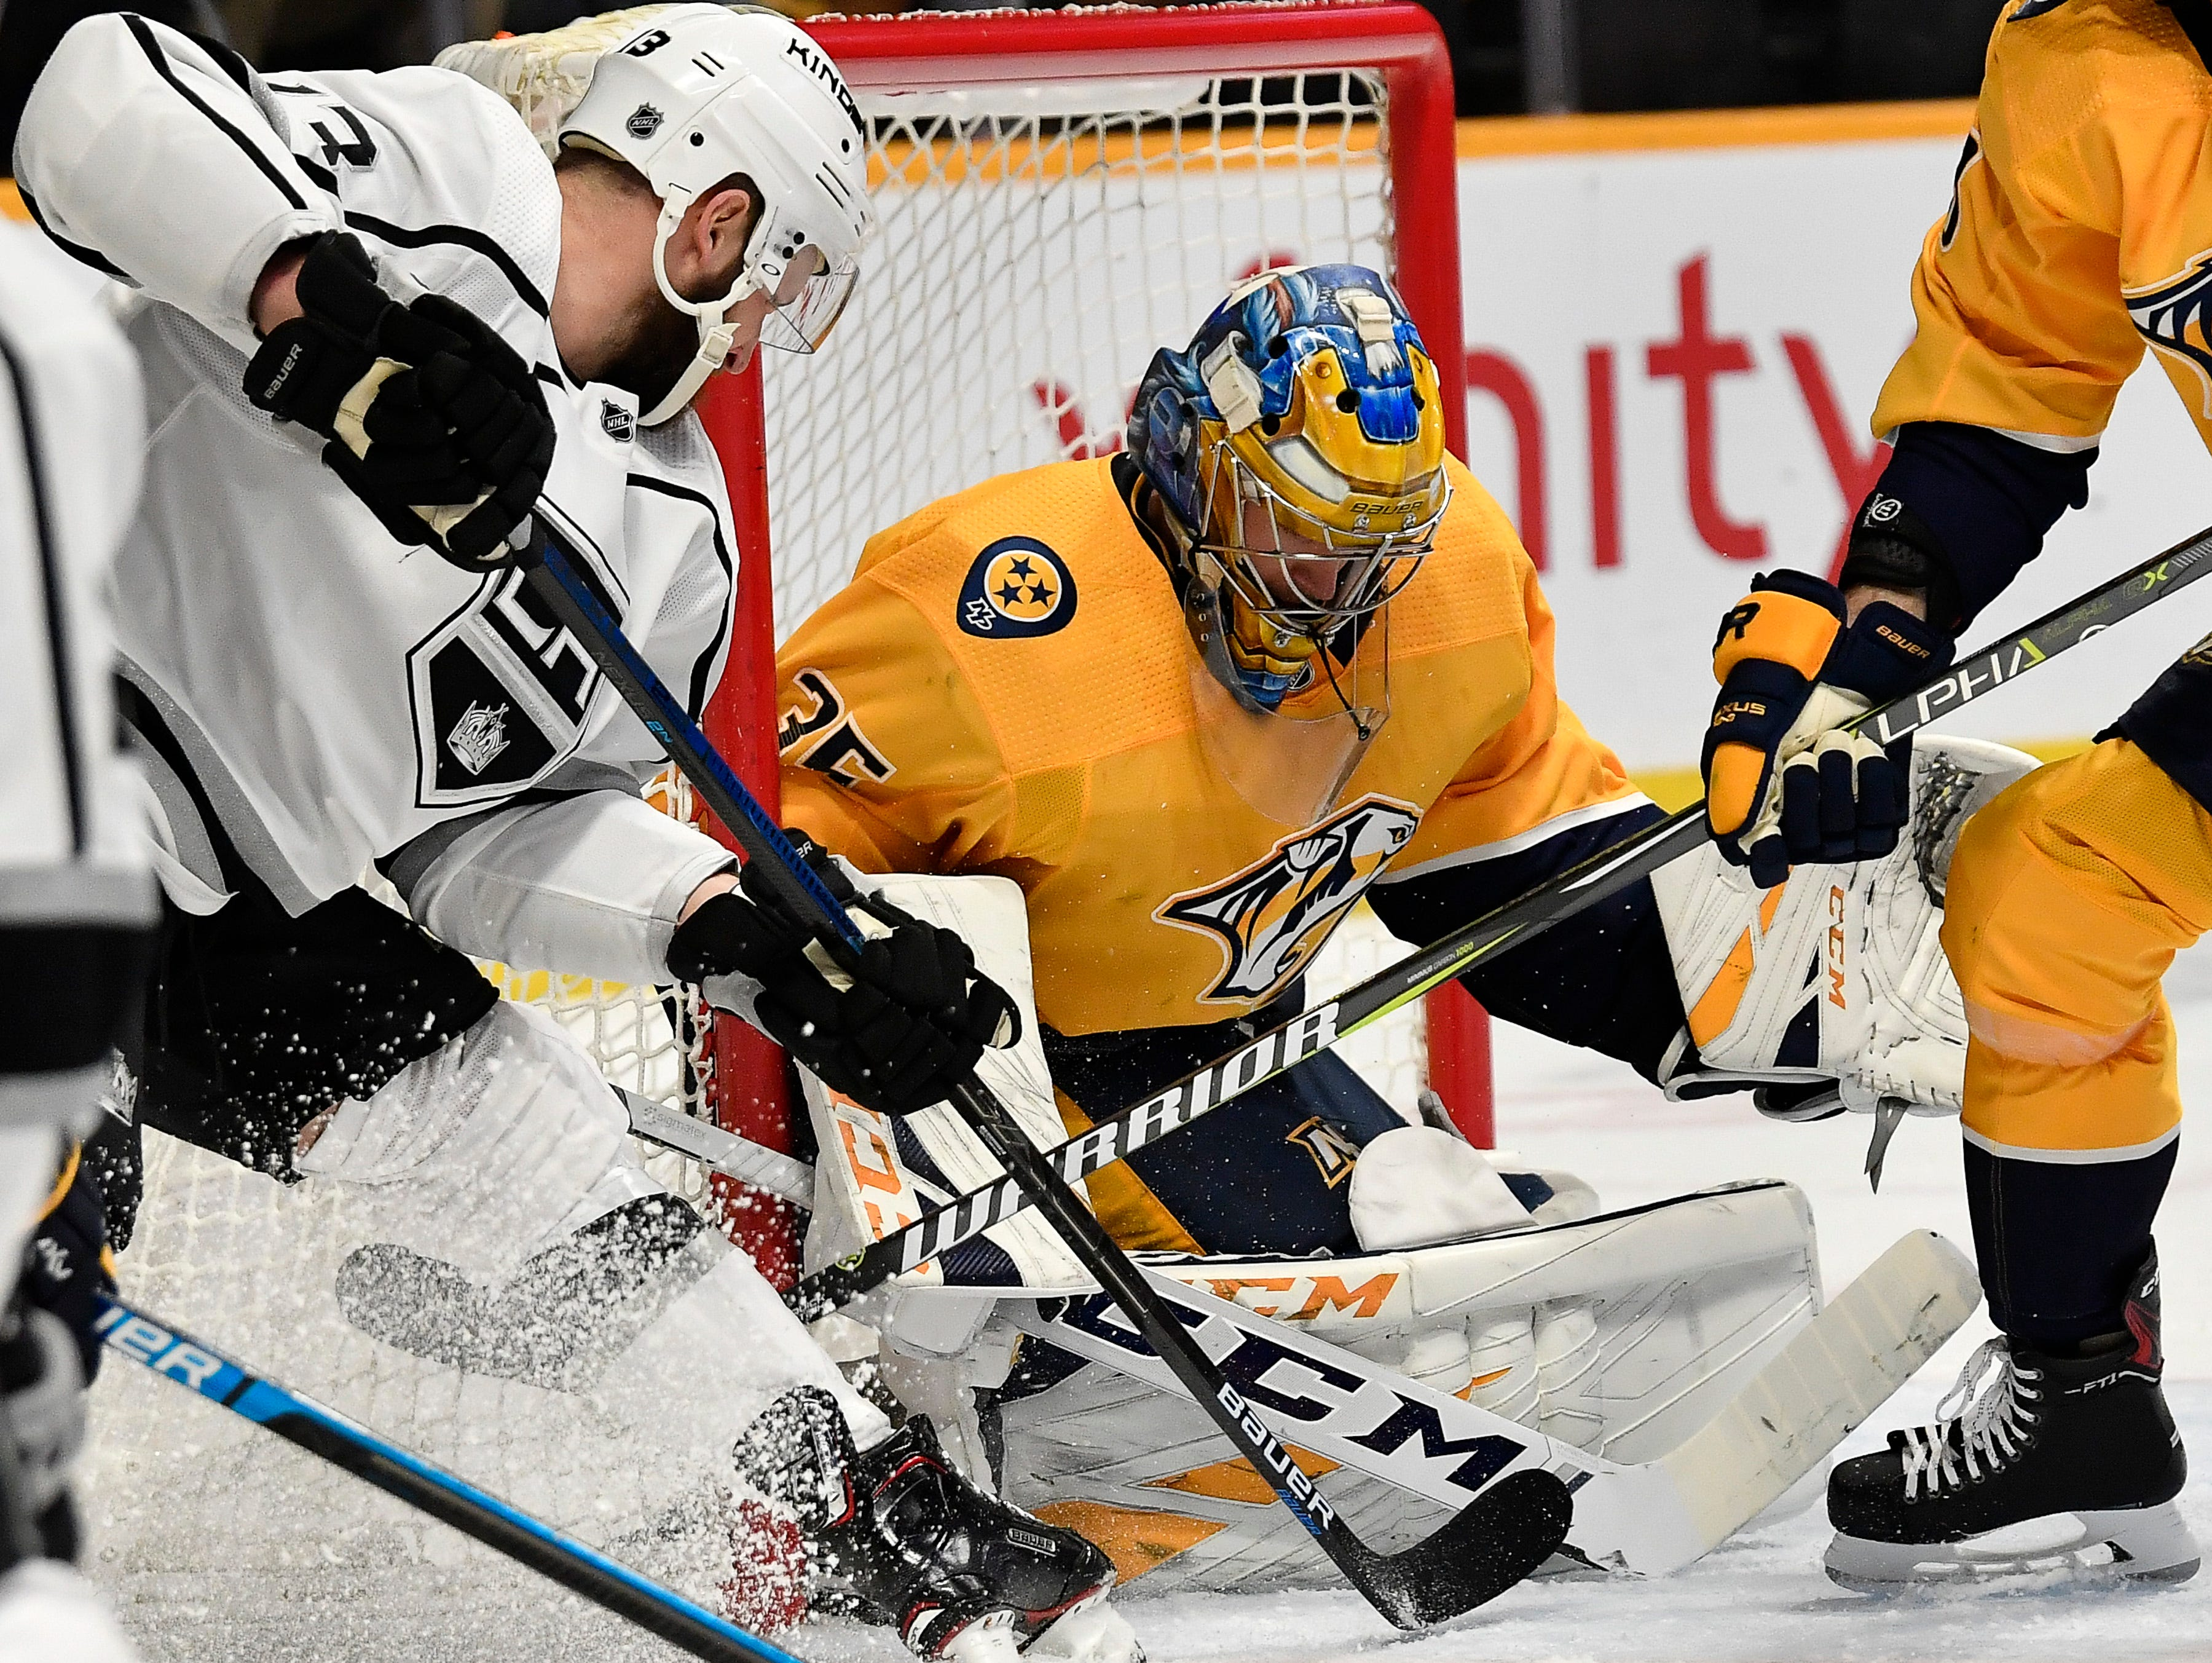 Predators goaltender Pekka Rinne (35) defends the goal as Kings left wing Kyle Clifford (13) attacks during the second period at Bridgestone Arena Thursday, Feb. 21, 2019 in Nashville, Tenn.